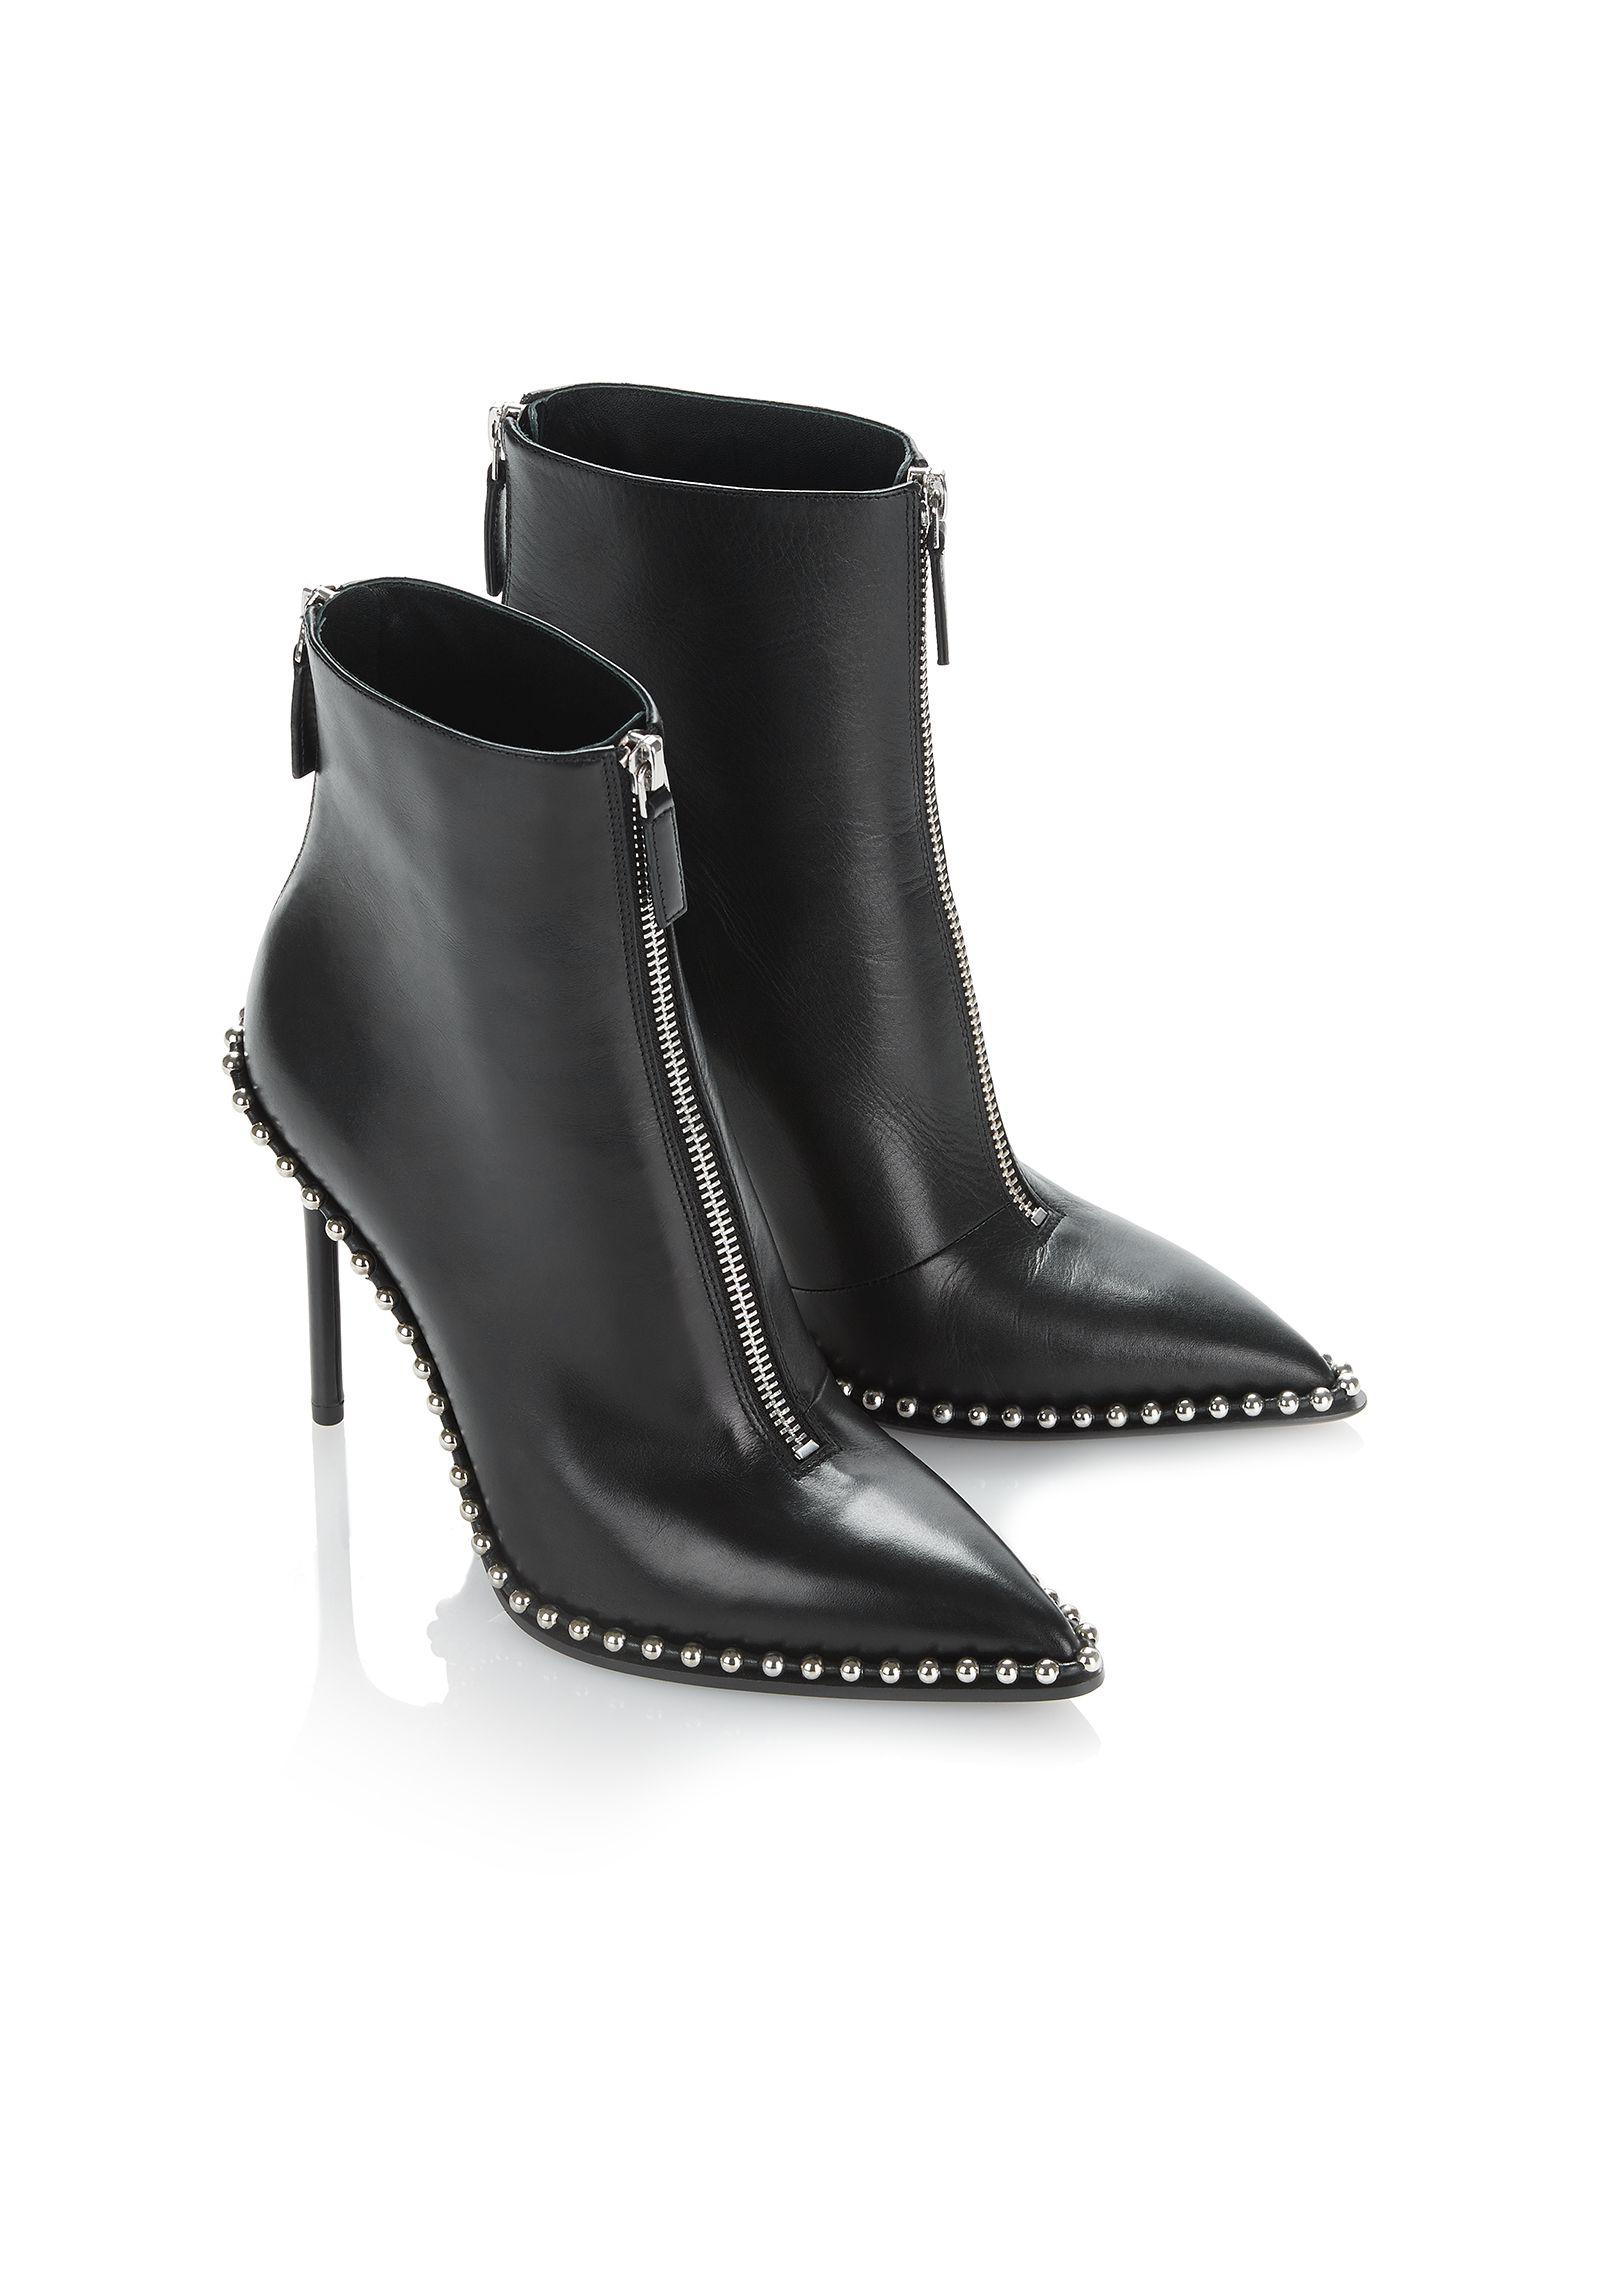 8adb3d33c4f Lyst - Alexander Wang Eri Boot in Black